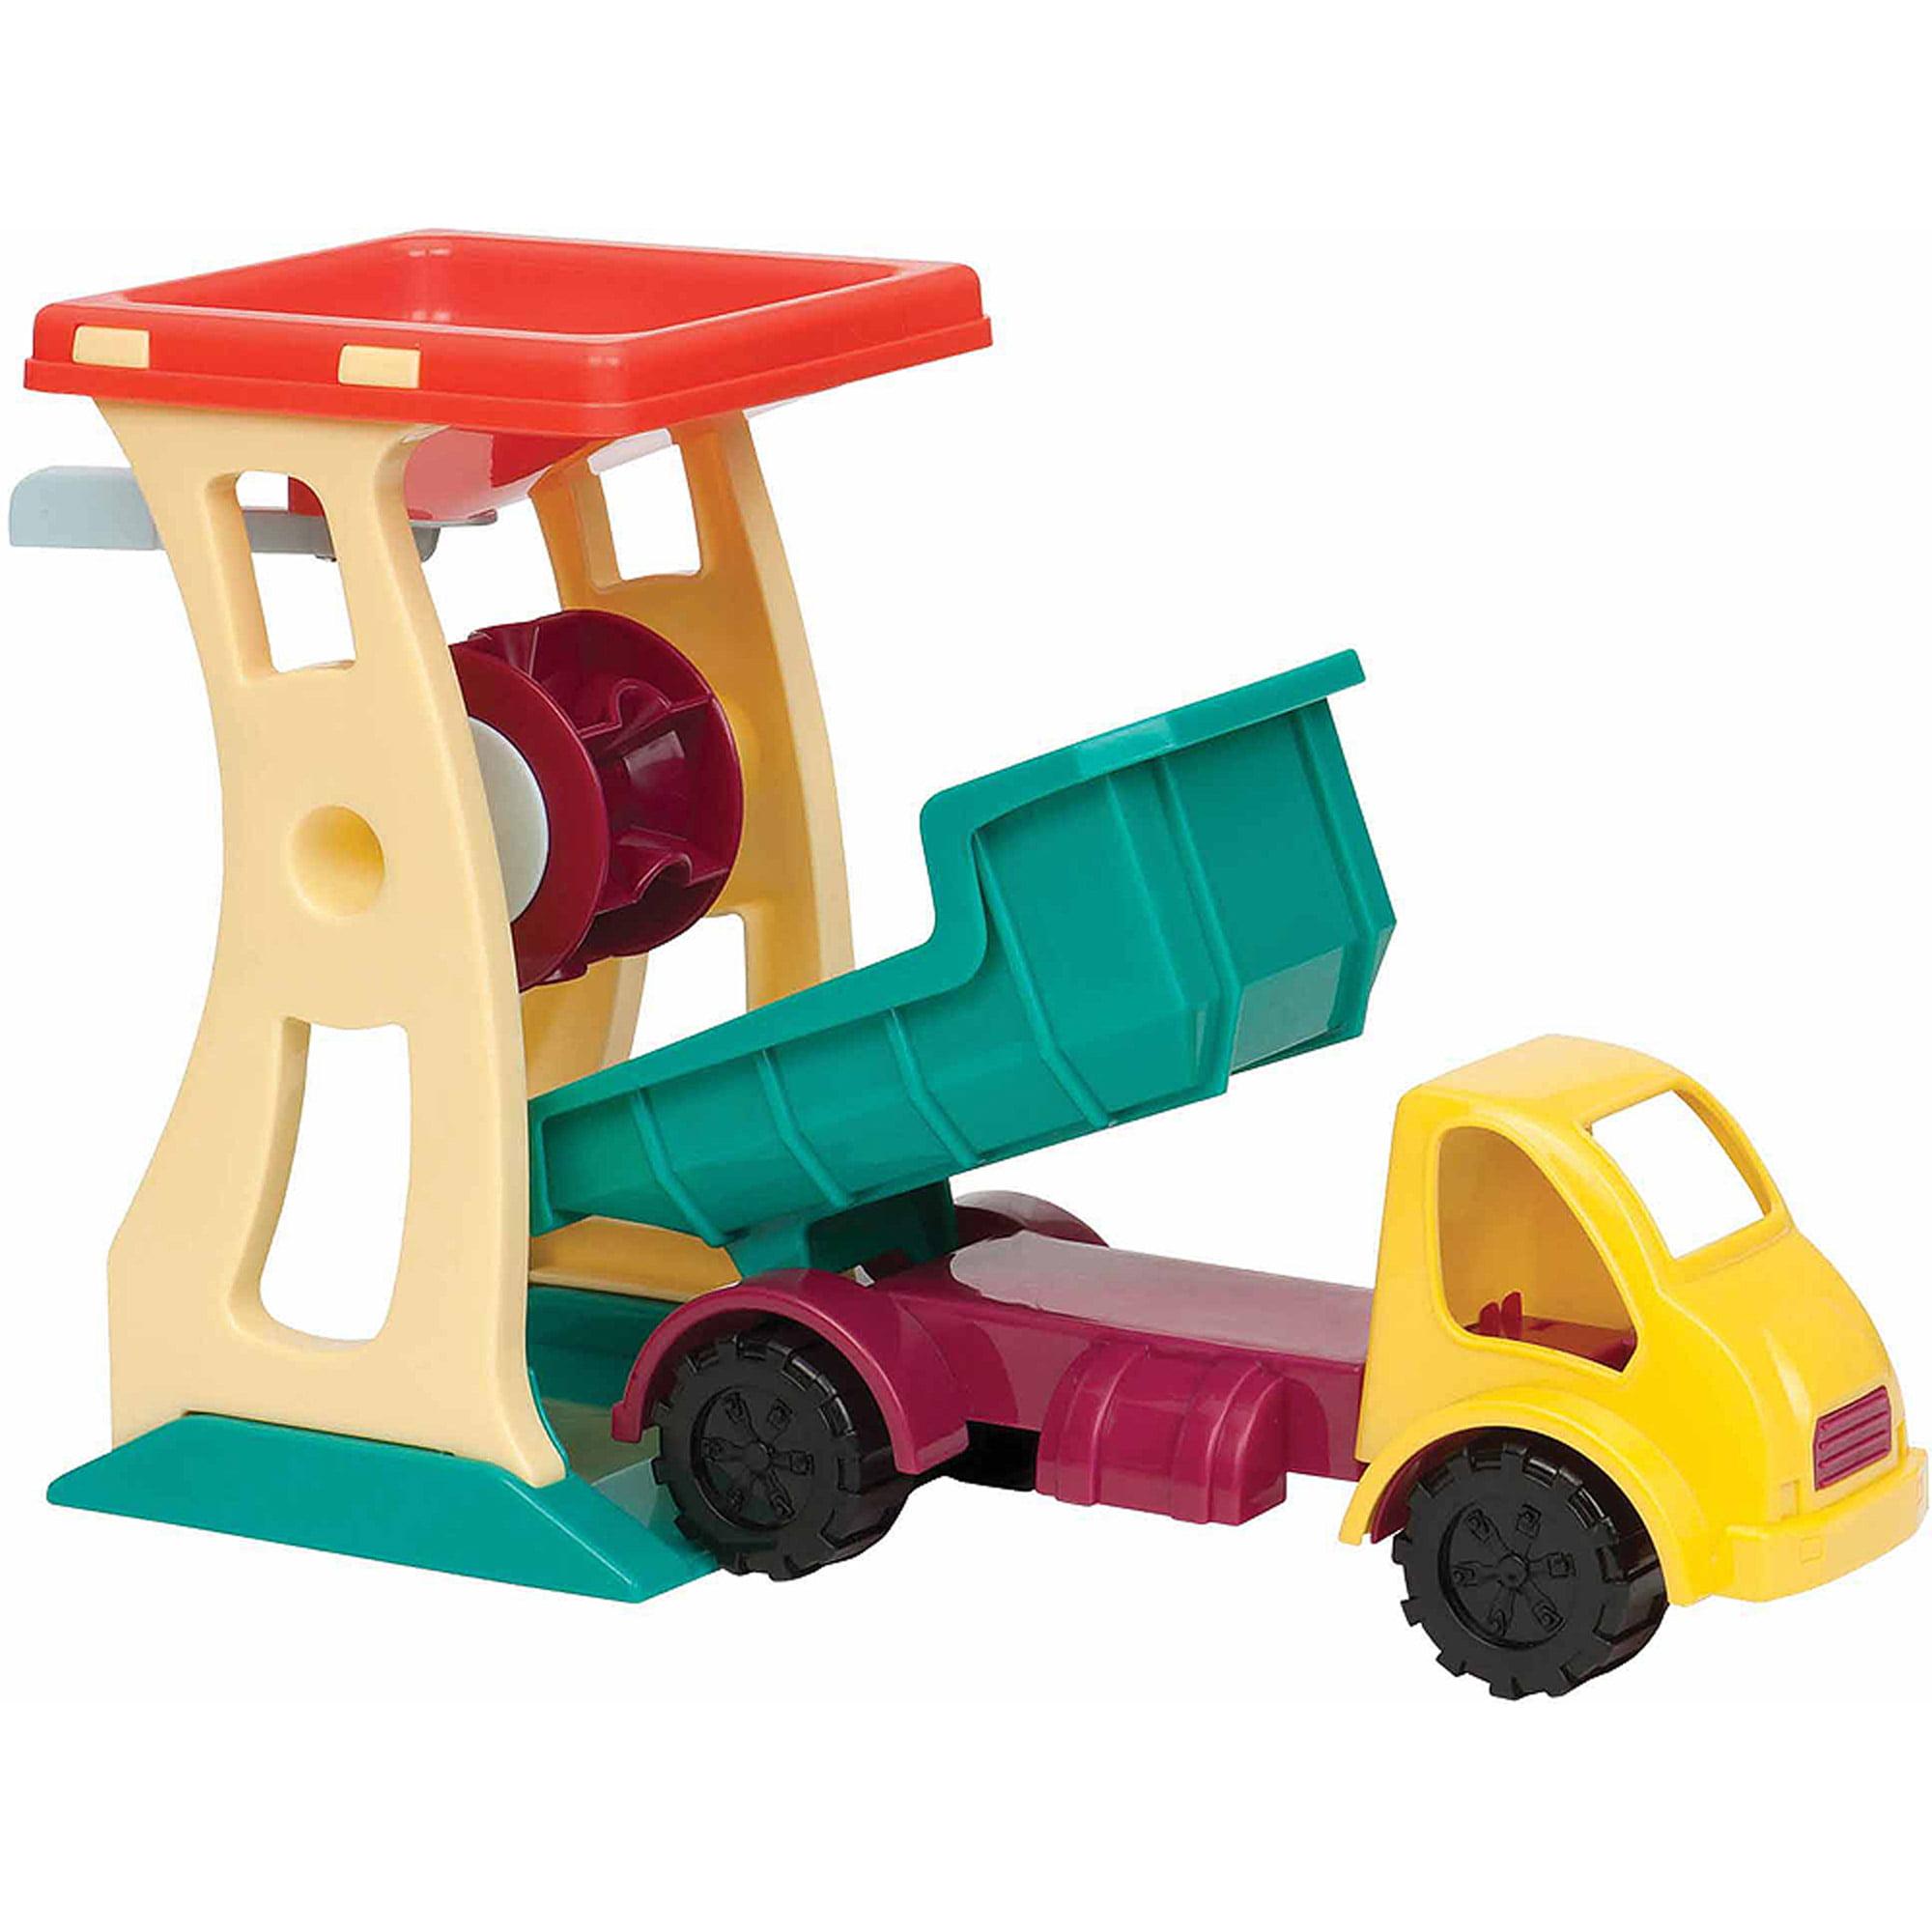 Battat Sand Loader and Truck